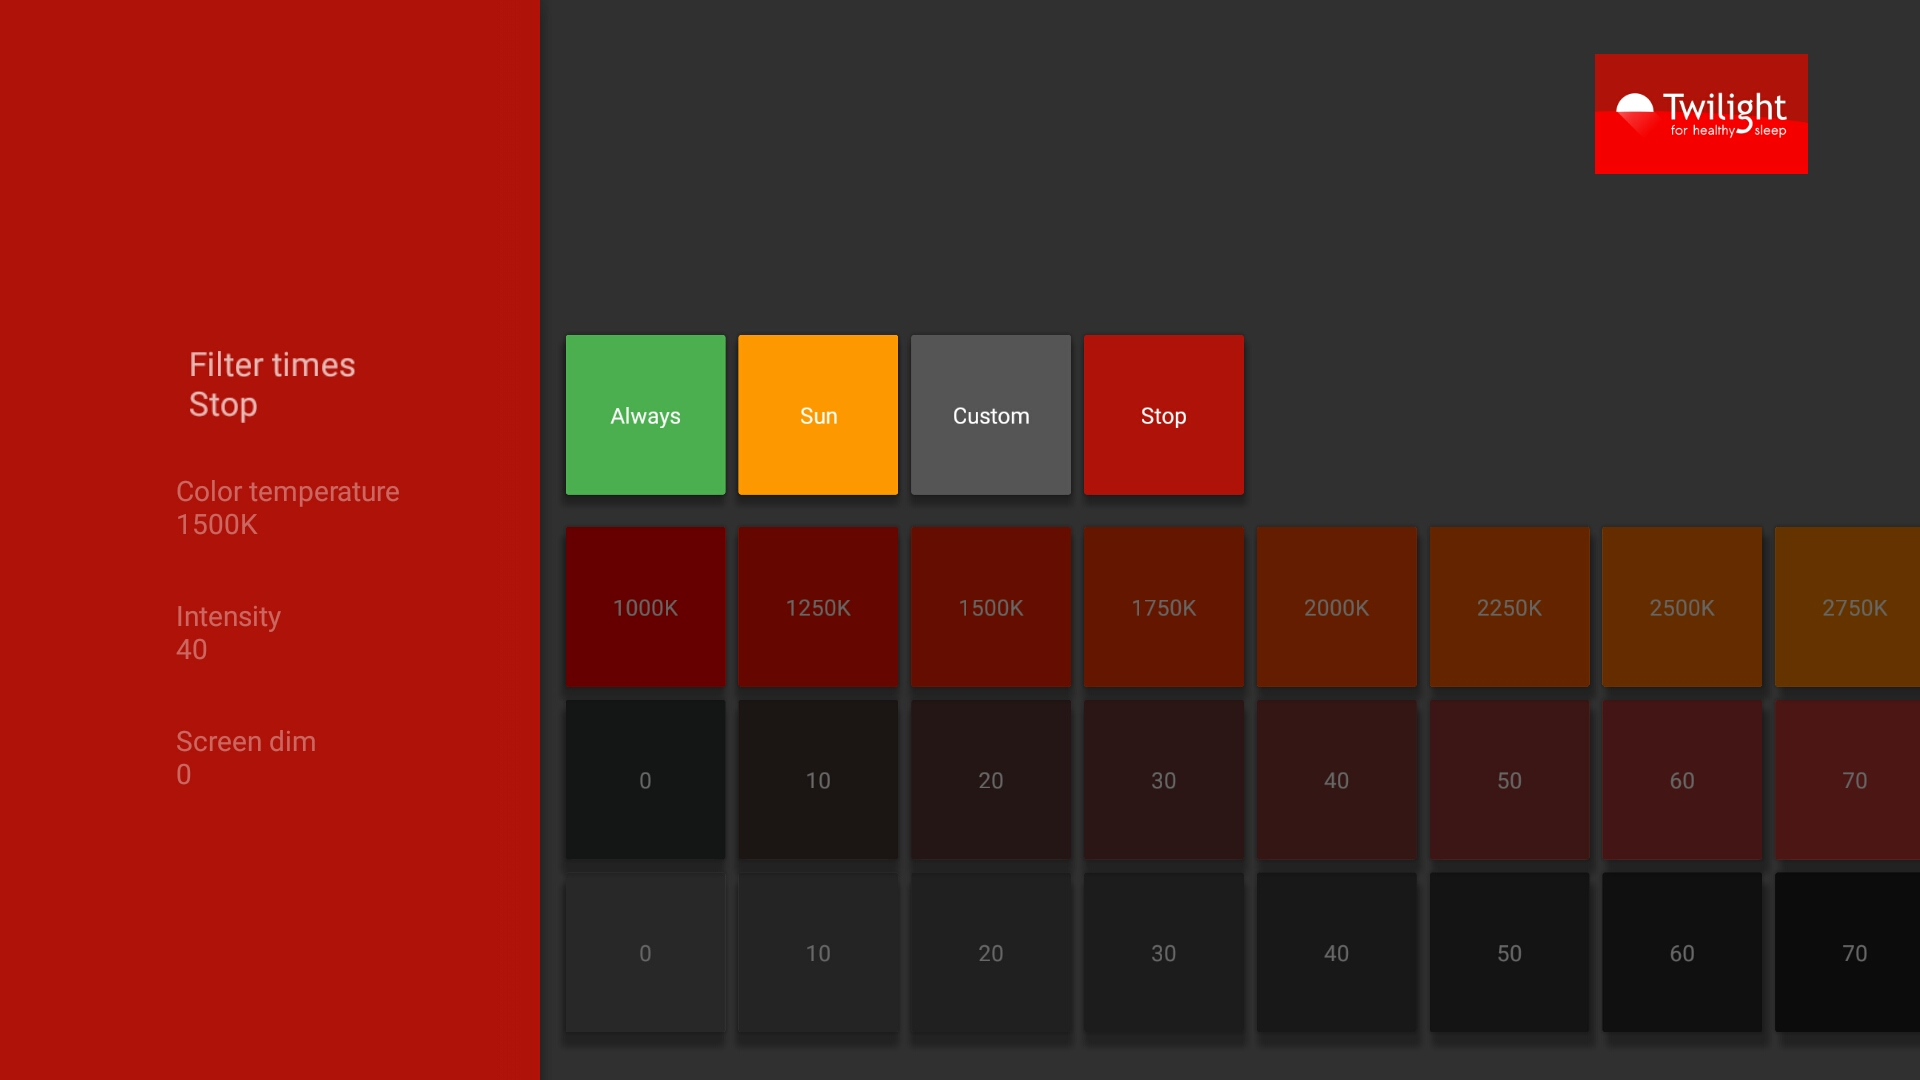 تحديث تطبيق Twilight يدعم الان اندرويد وير و Android TV